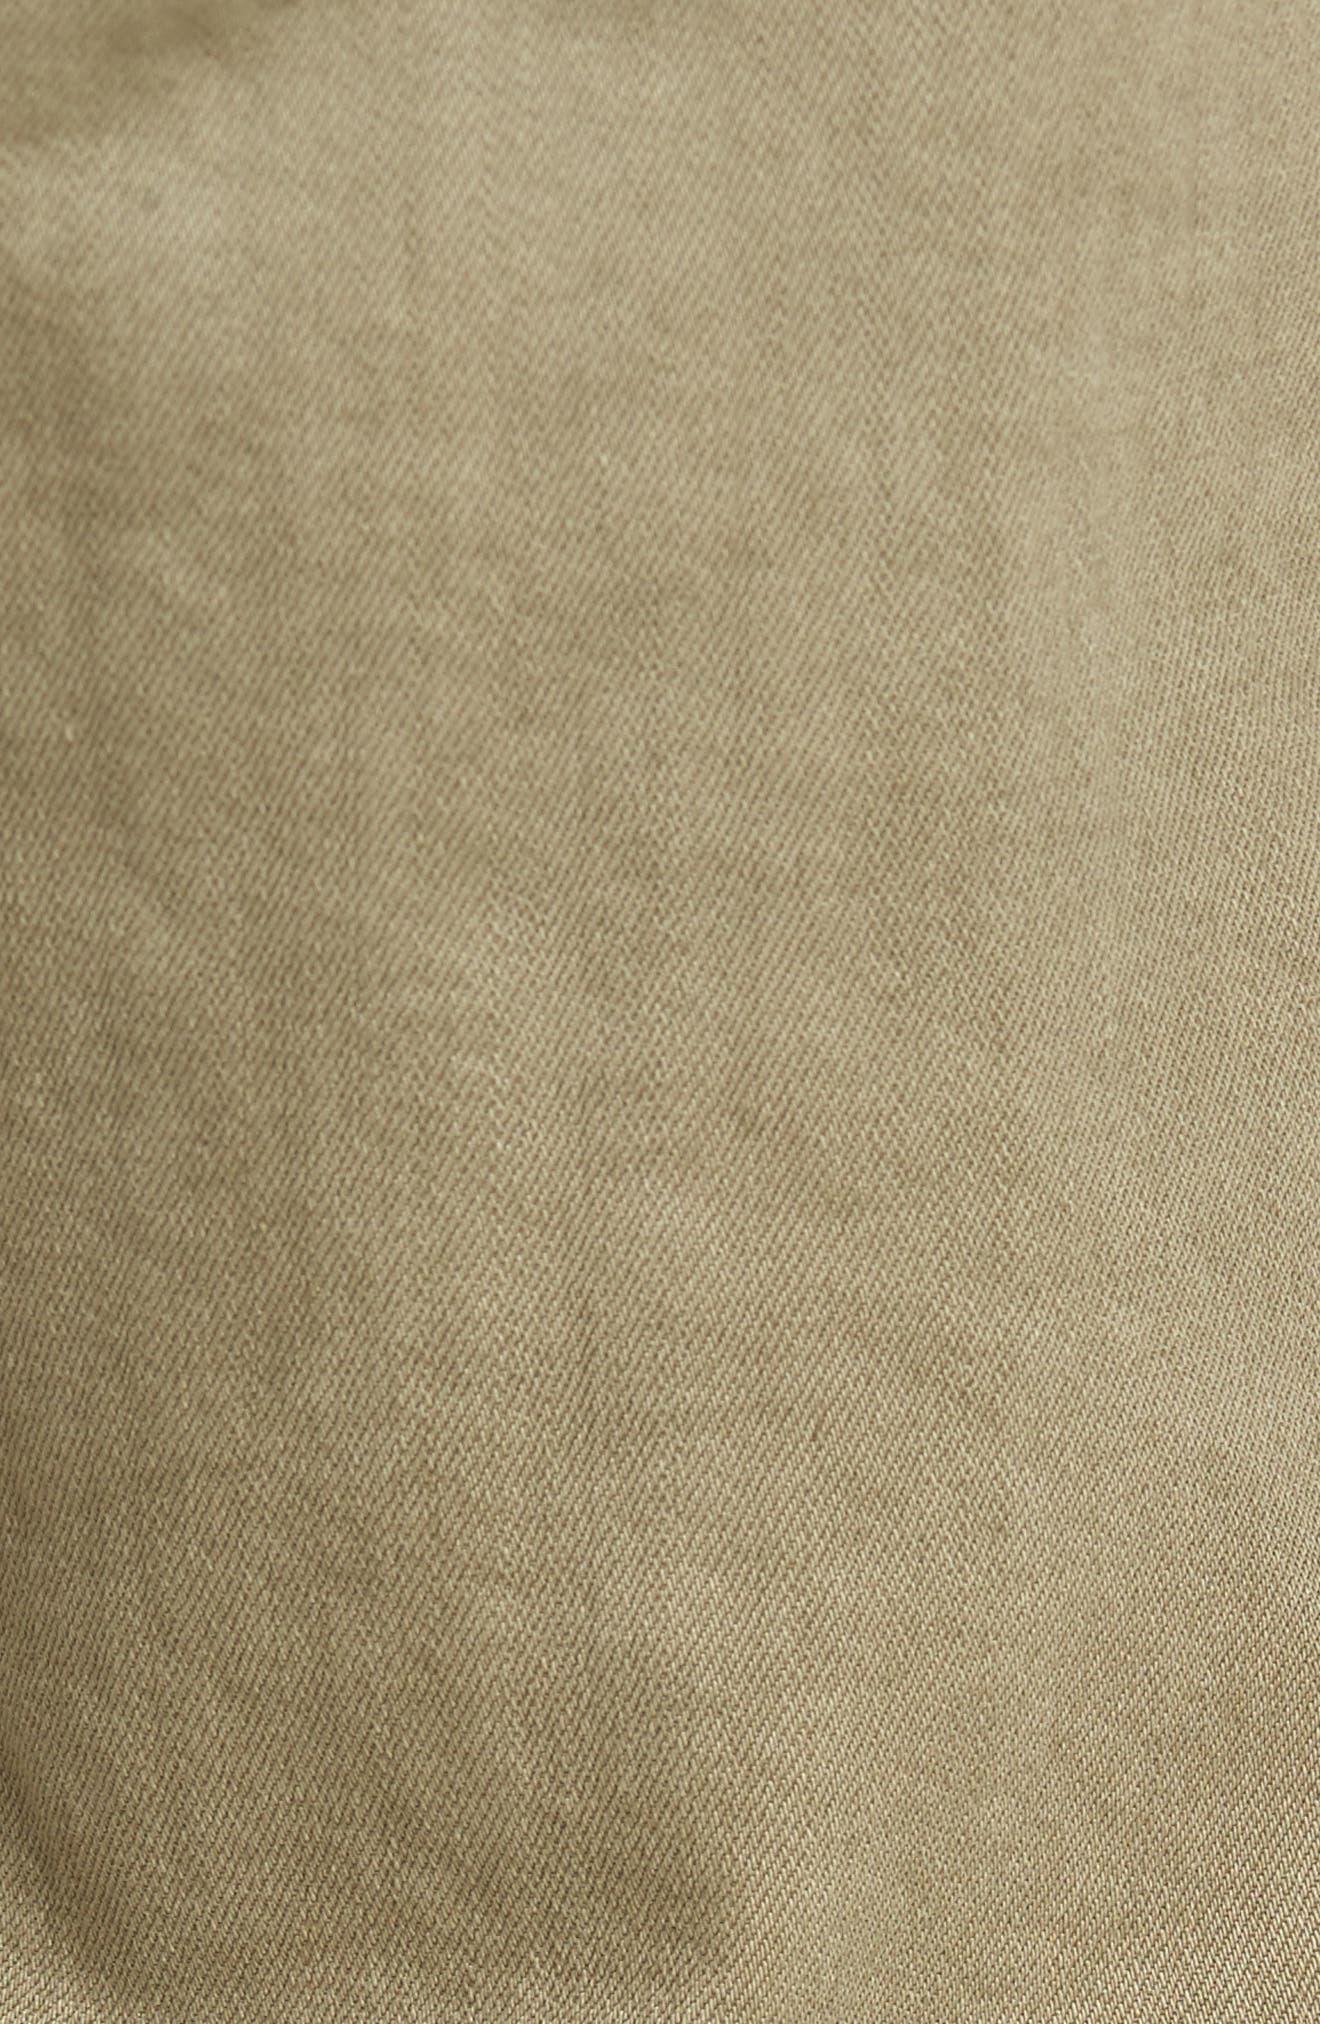 Tellis Slim Fit Jeans,                             Alternate thumbnail 5, color,                             316